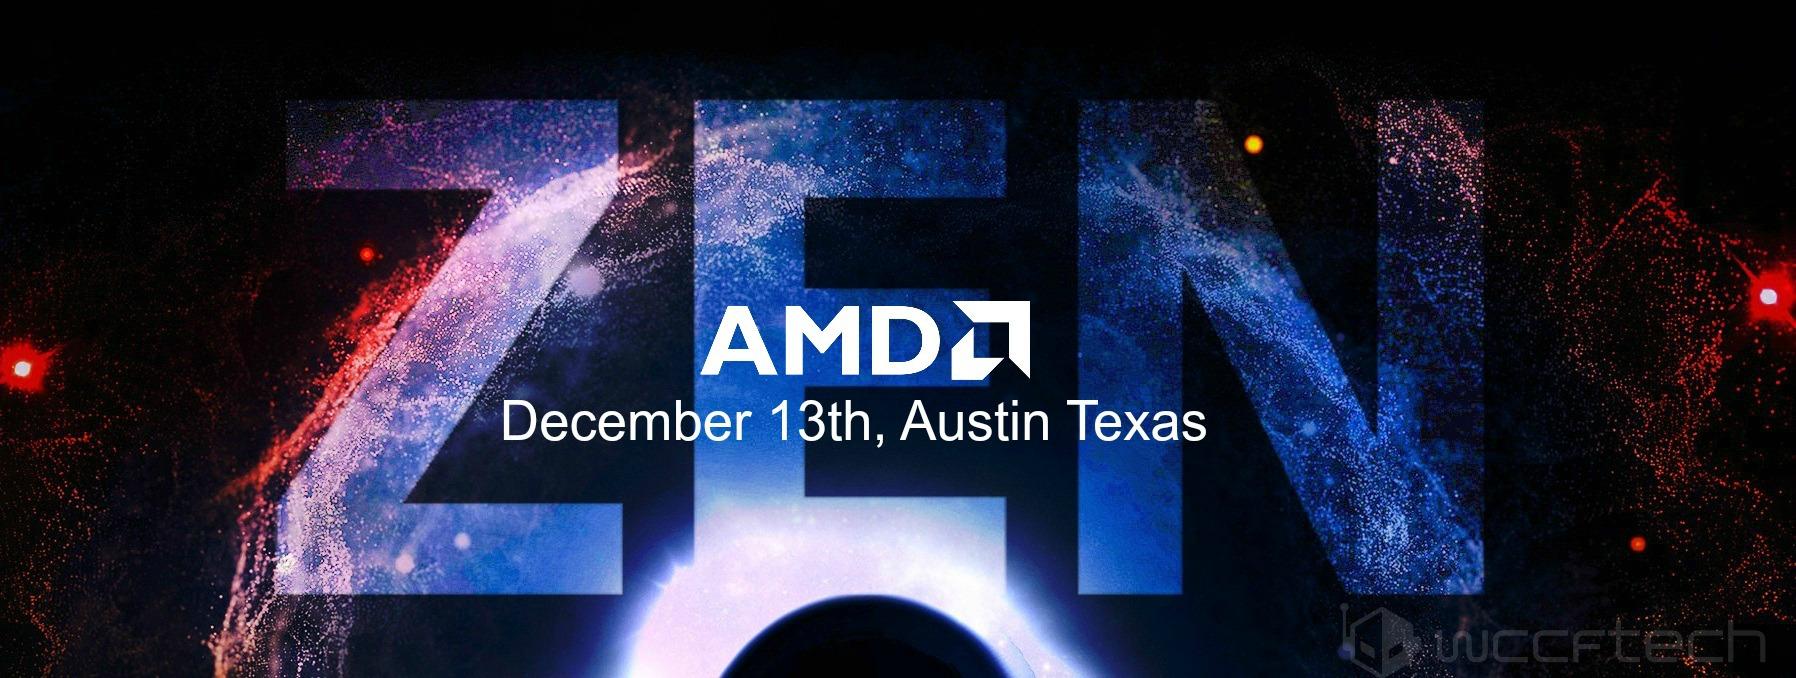 AMD Zen Feature New Horizon Event